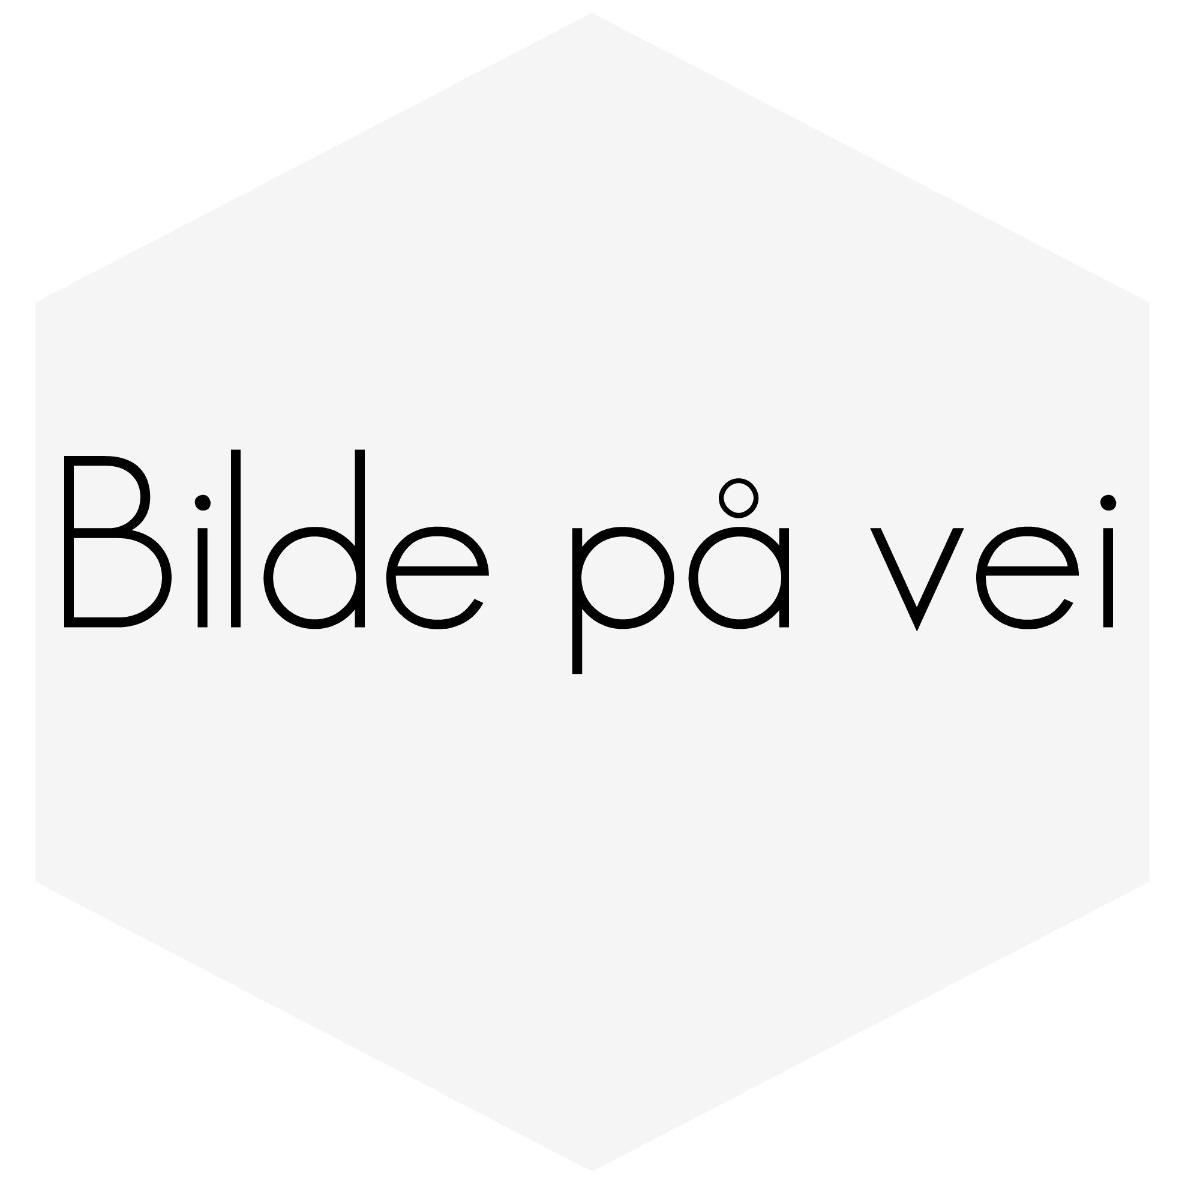 SILIKONSLANGE ARMERT BLÅ 0,5'' (13MM),pris pr meter